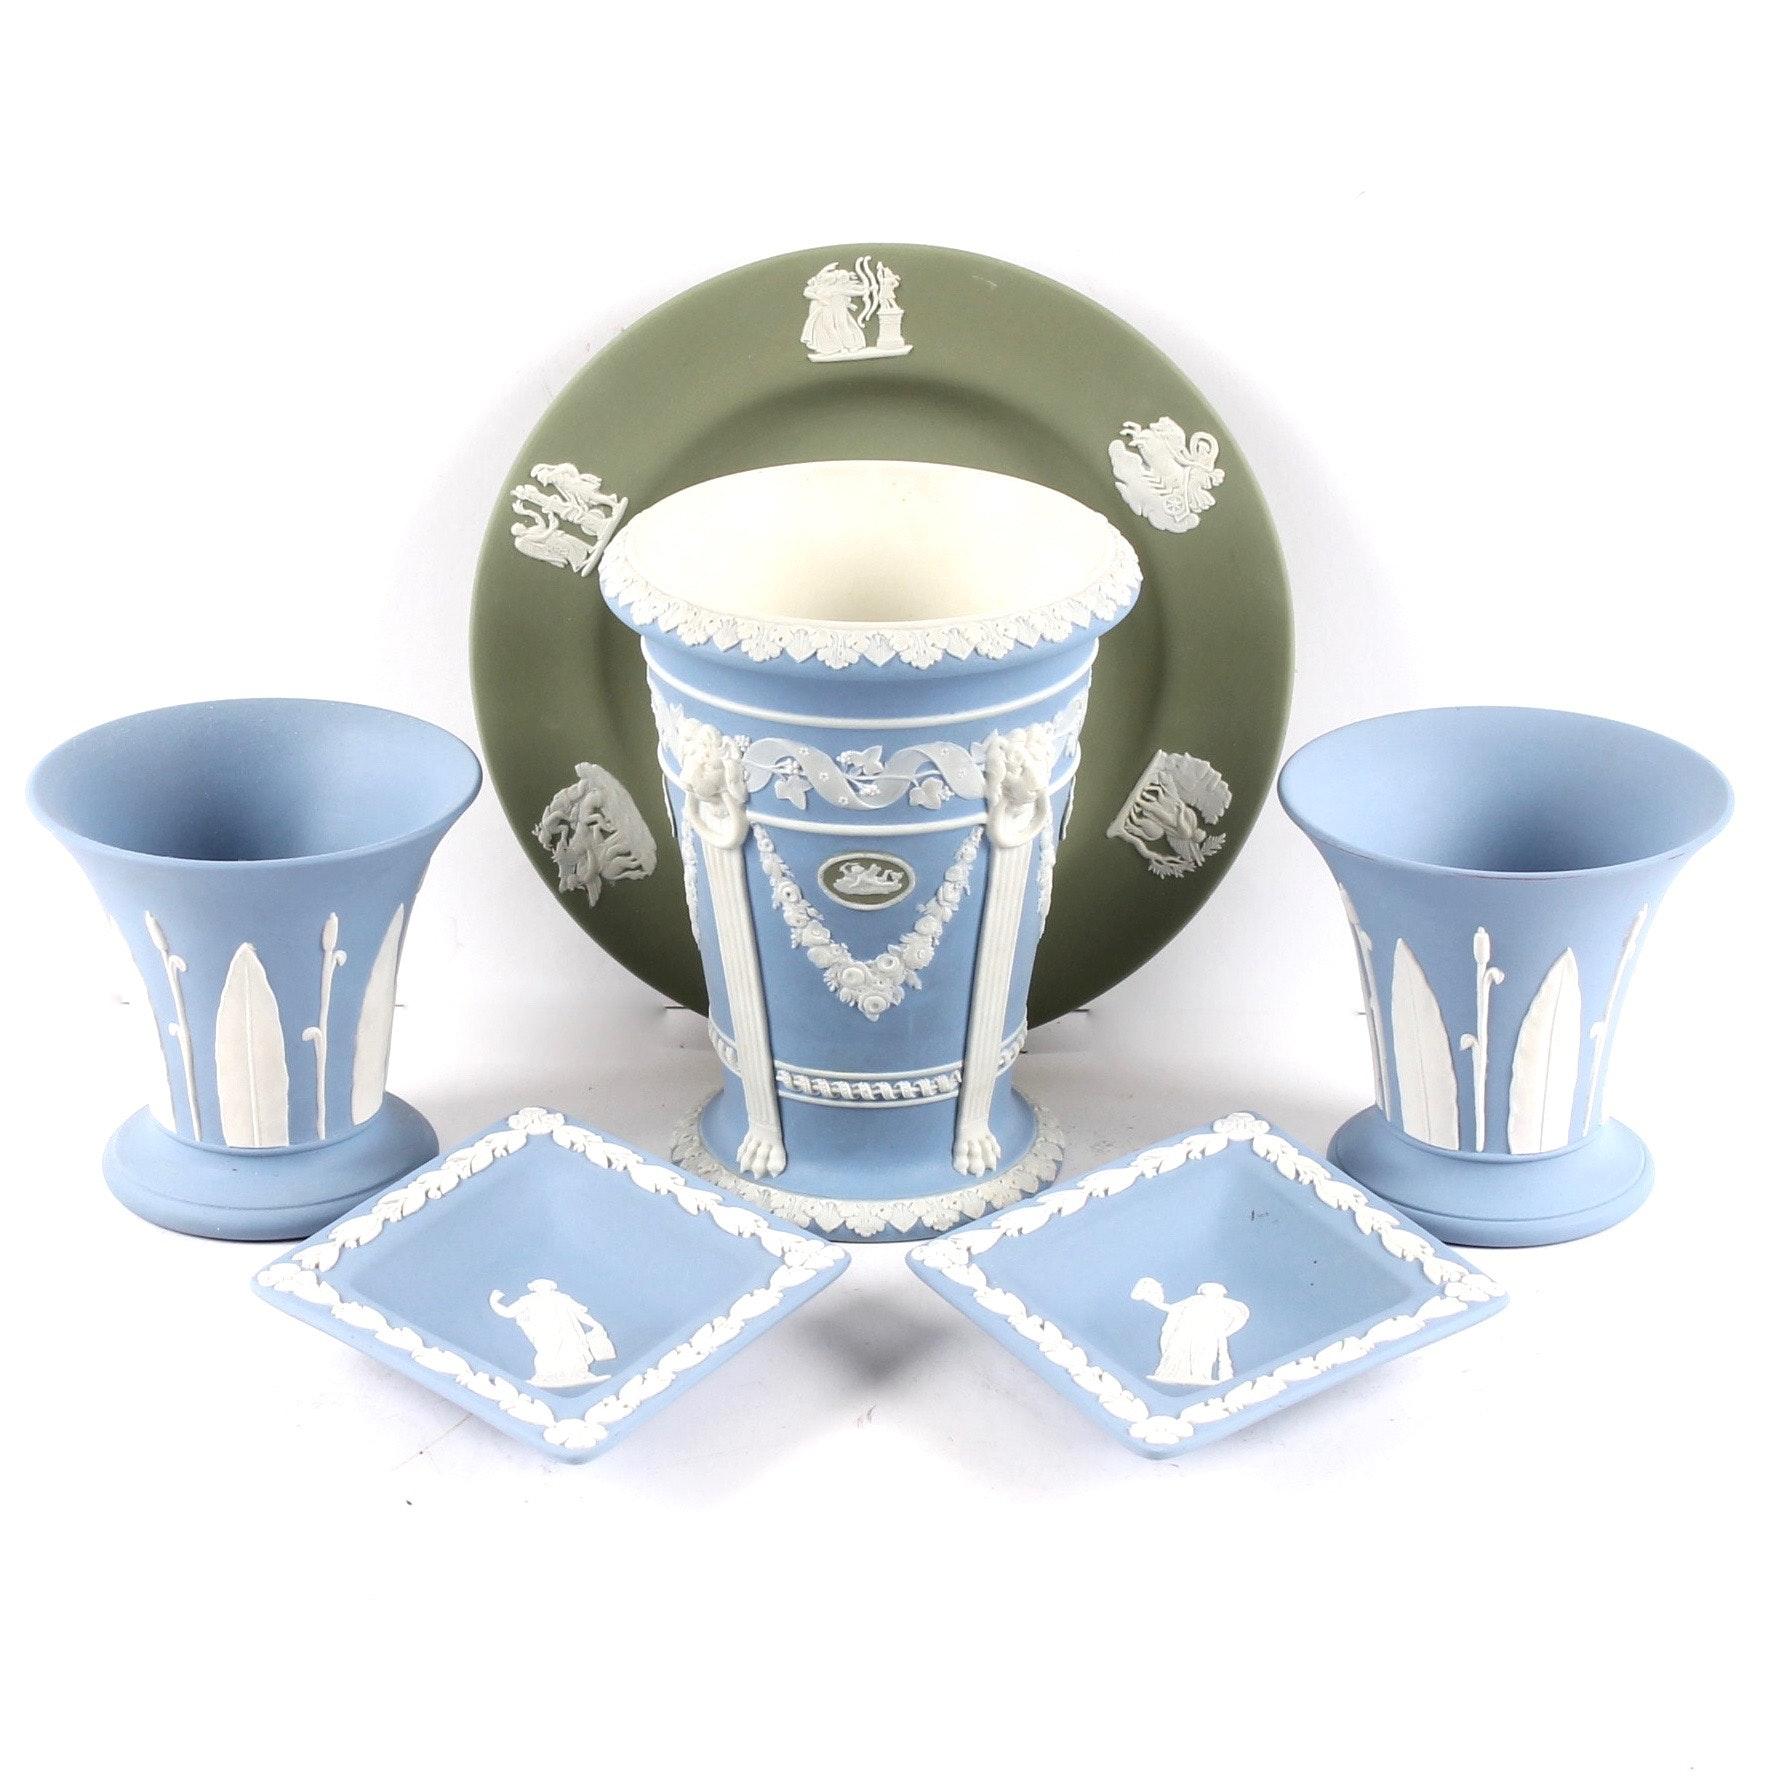 Wedgwood Jasperware Cachepots, Plate, and Trinket Dishes